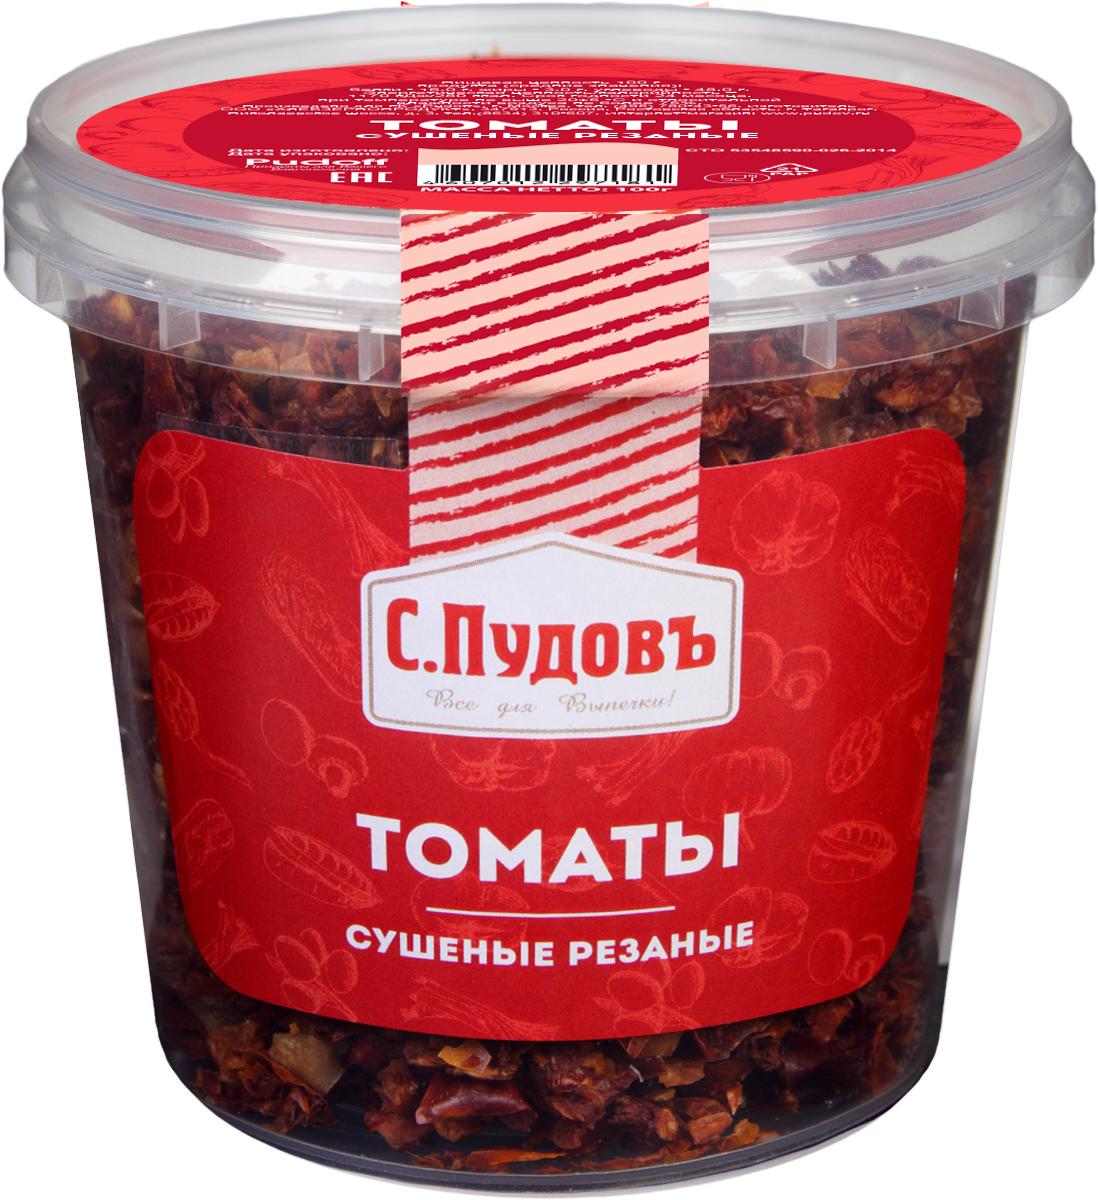 С. Пудовъ Пудовъ томаты сушеные резаные, 100 г 4607012297181